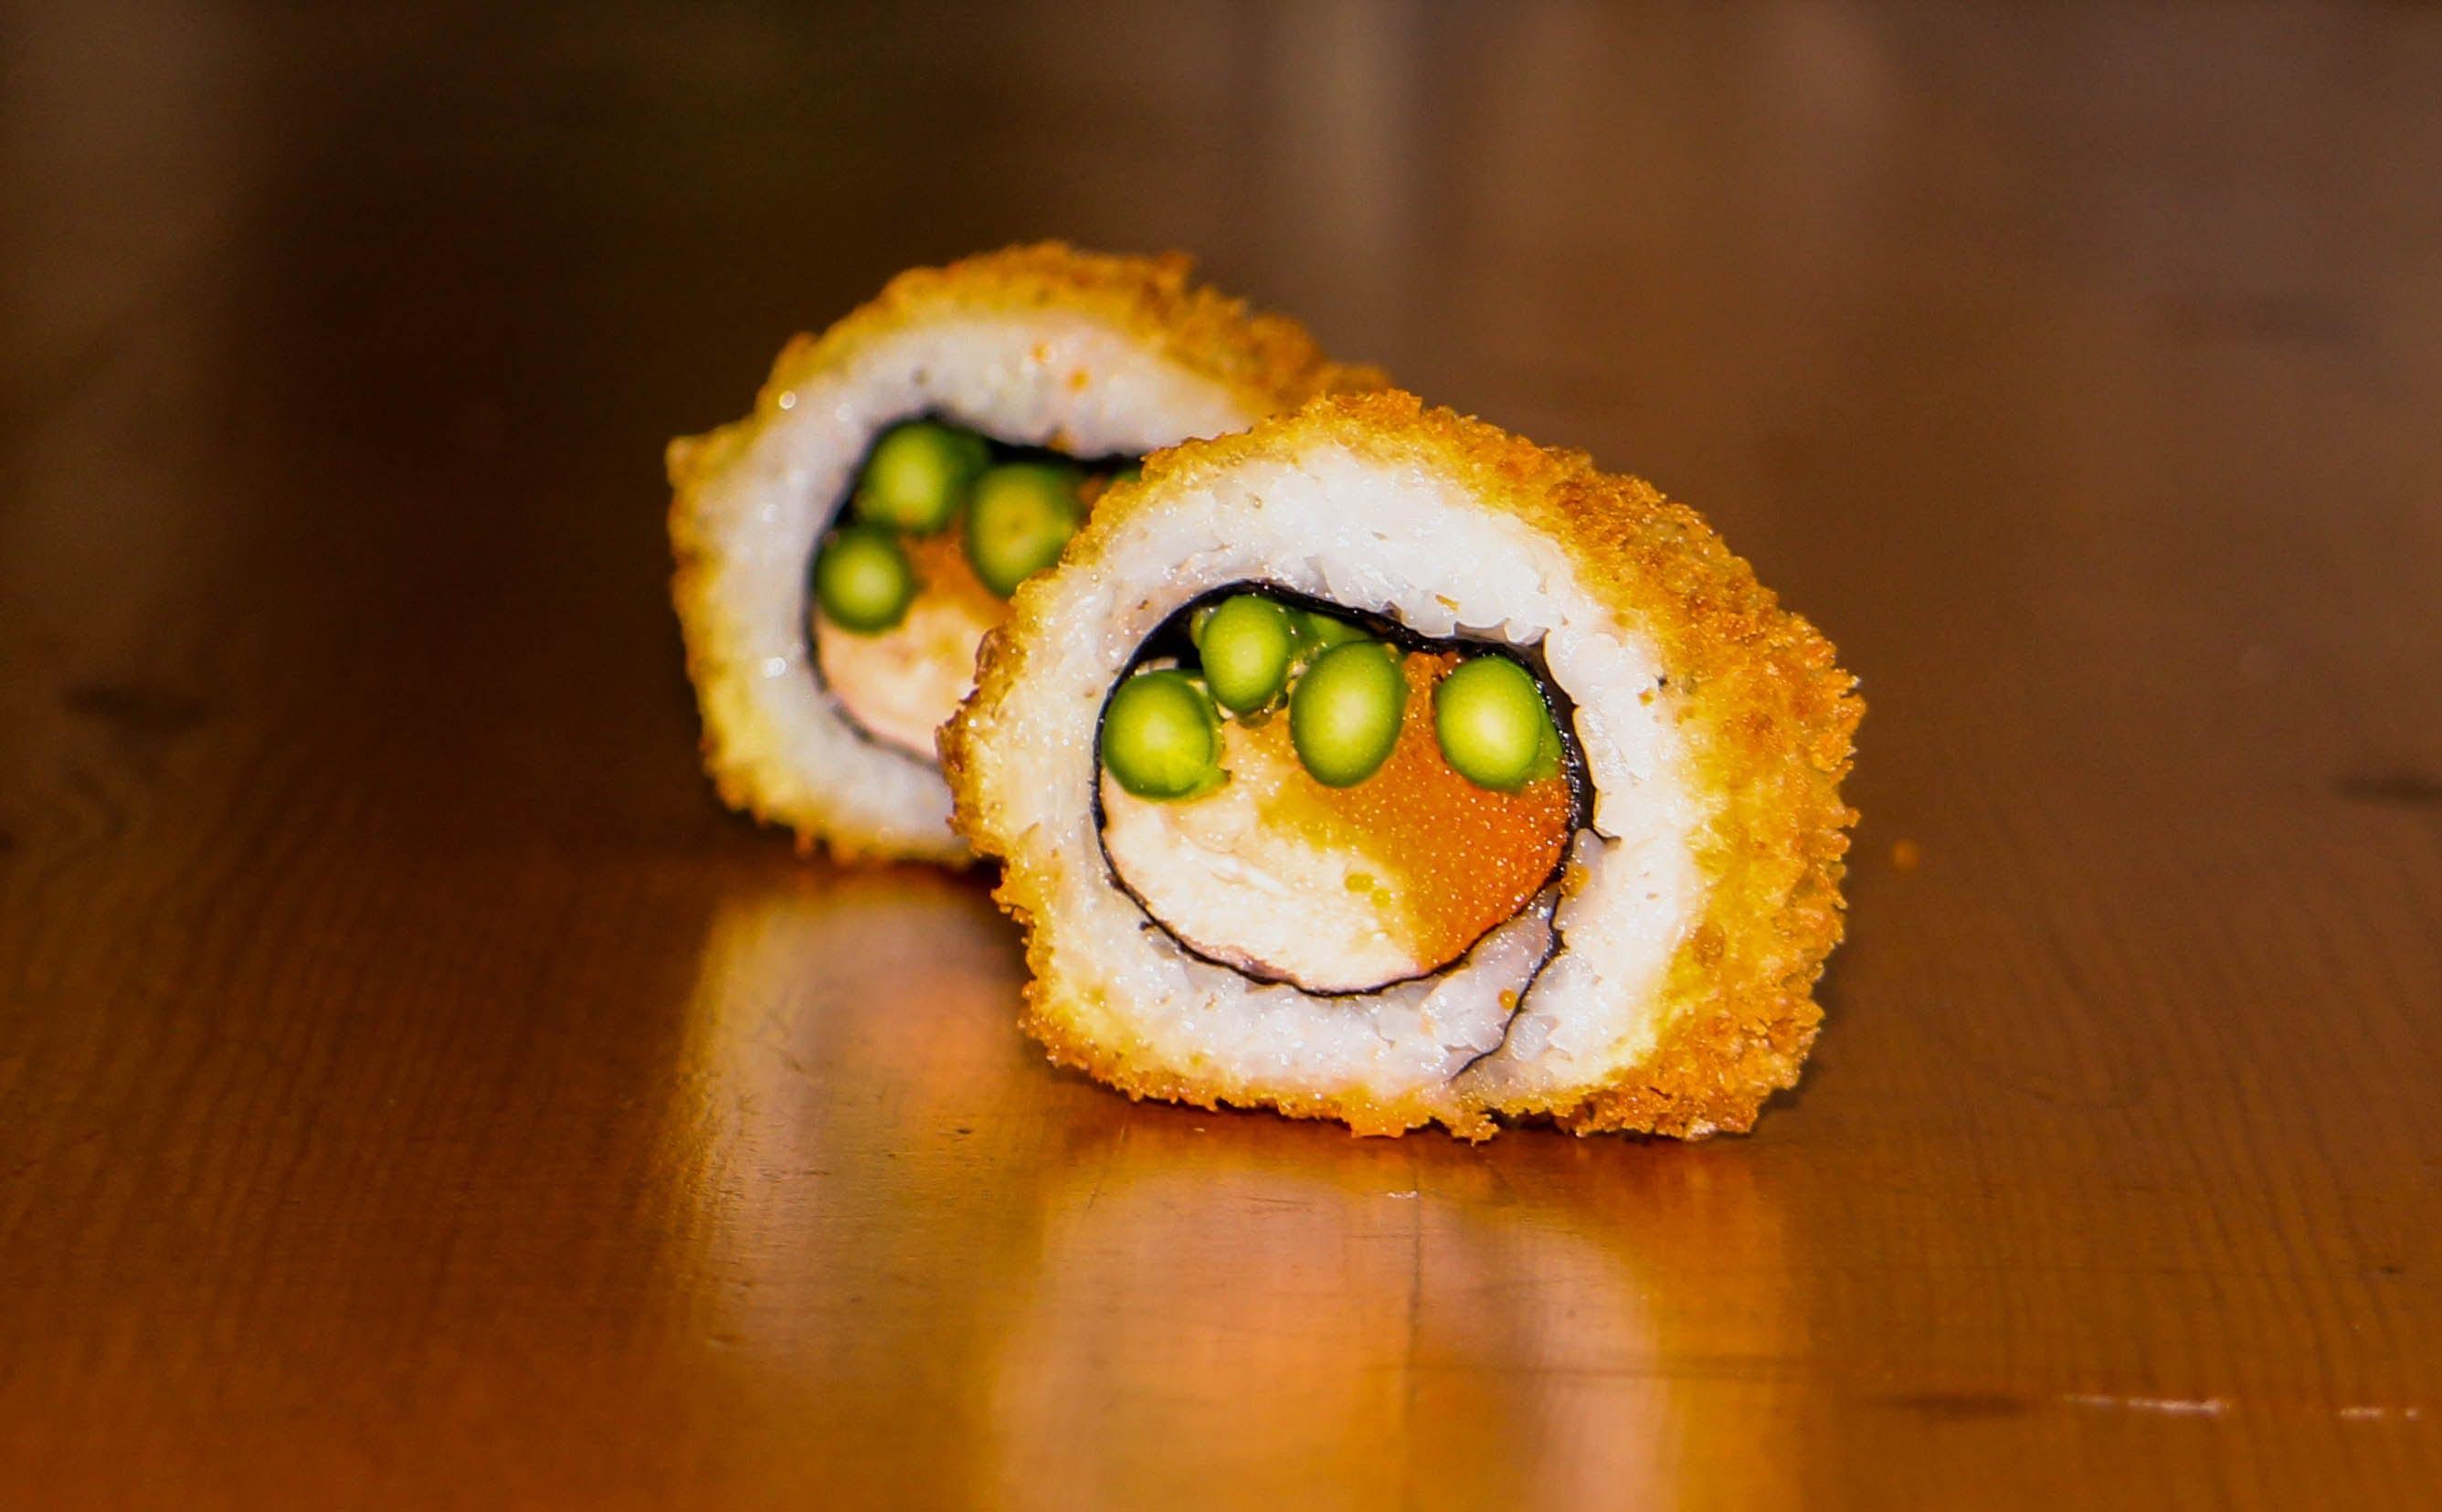 Deep Fried Sushi Roll Recipe – Crispy Tempura Recipe